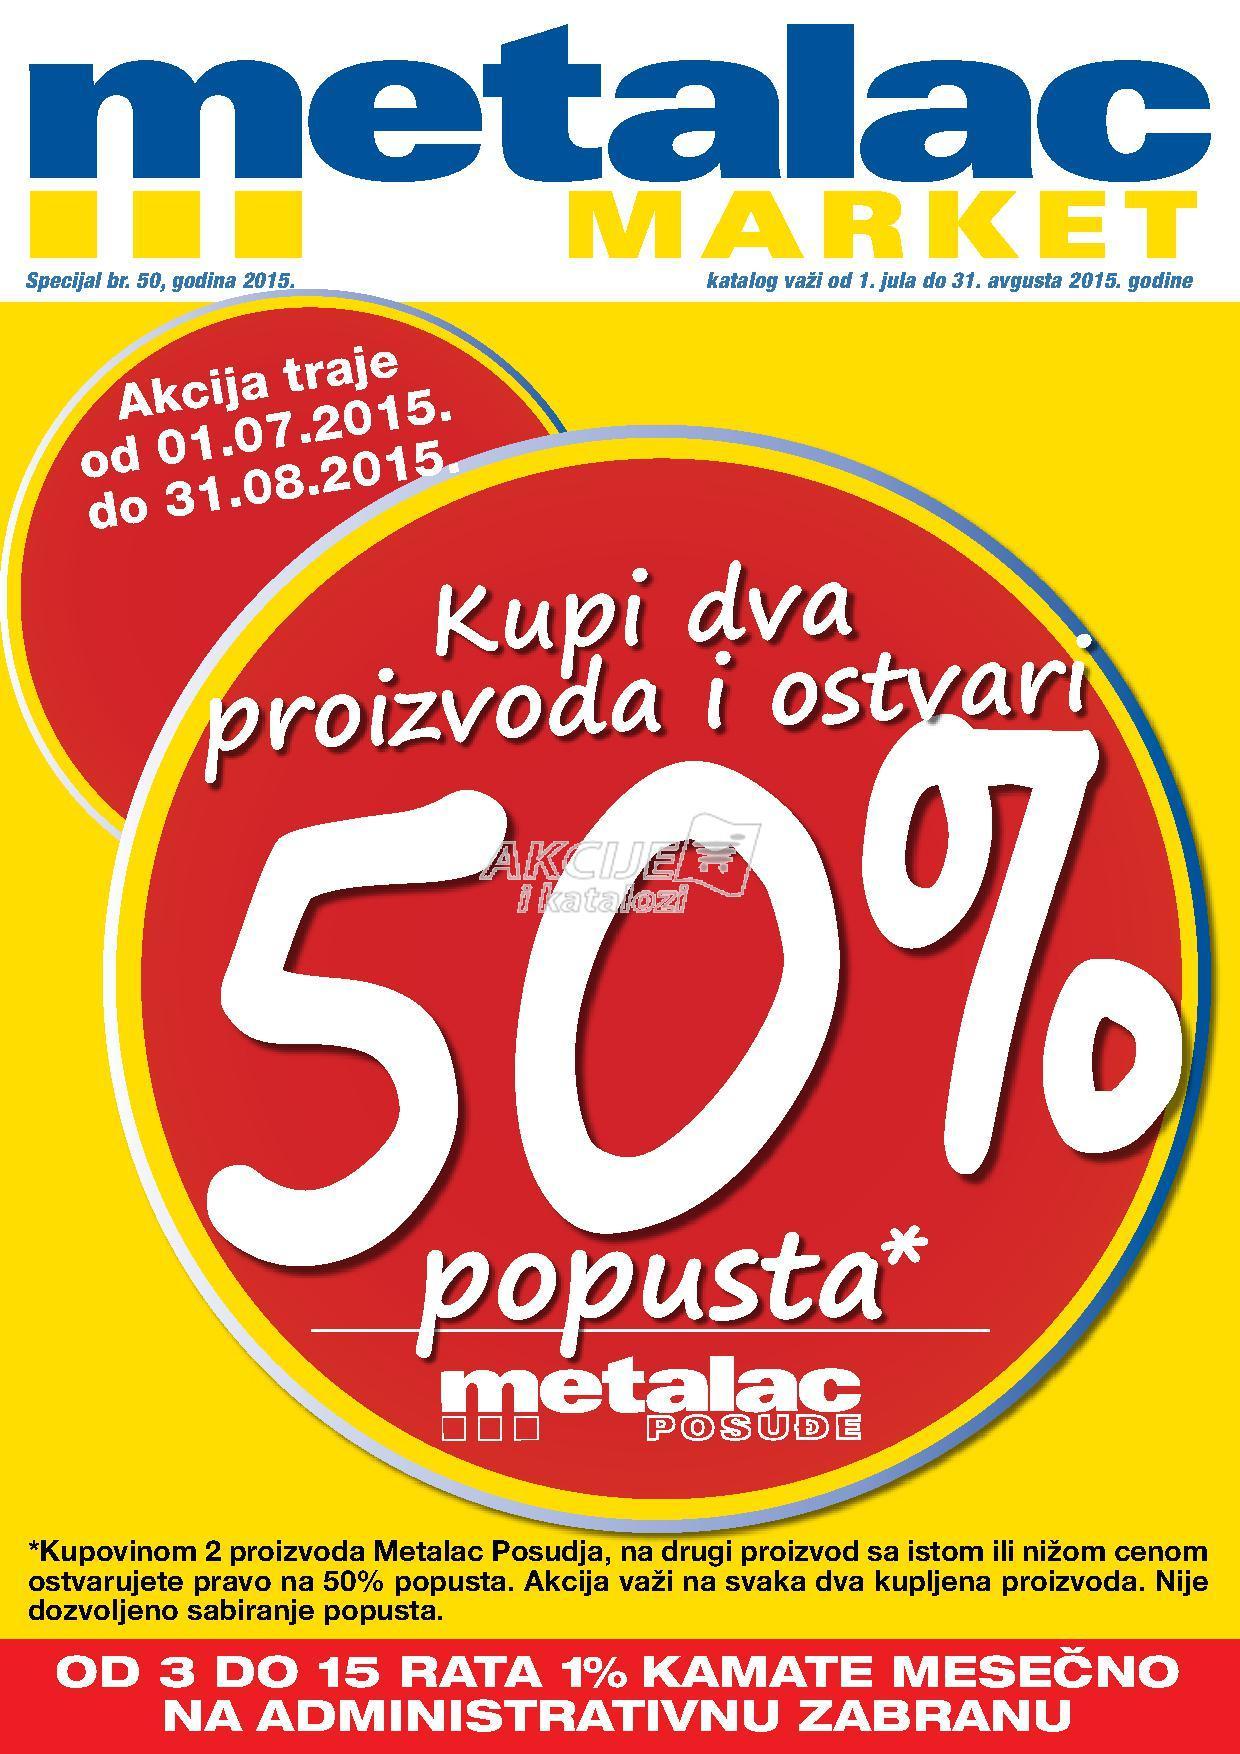 Metalac Market akcija letnje ponude